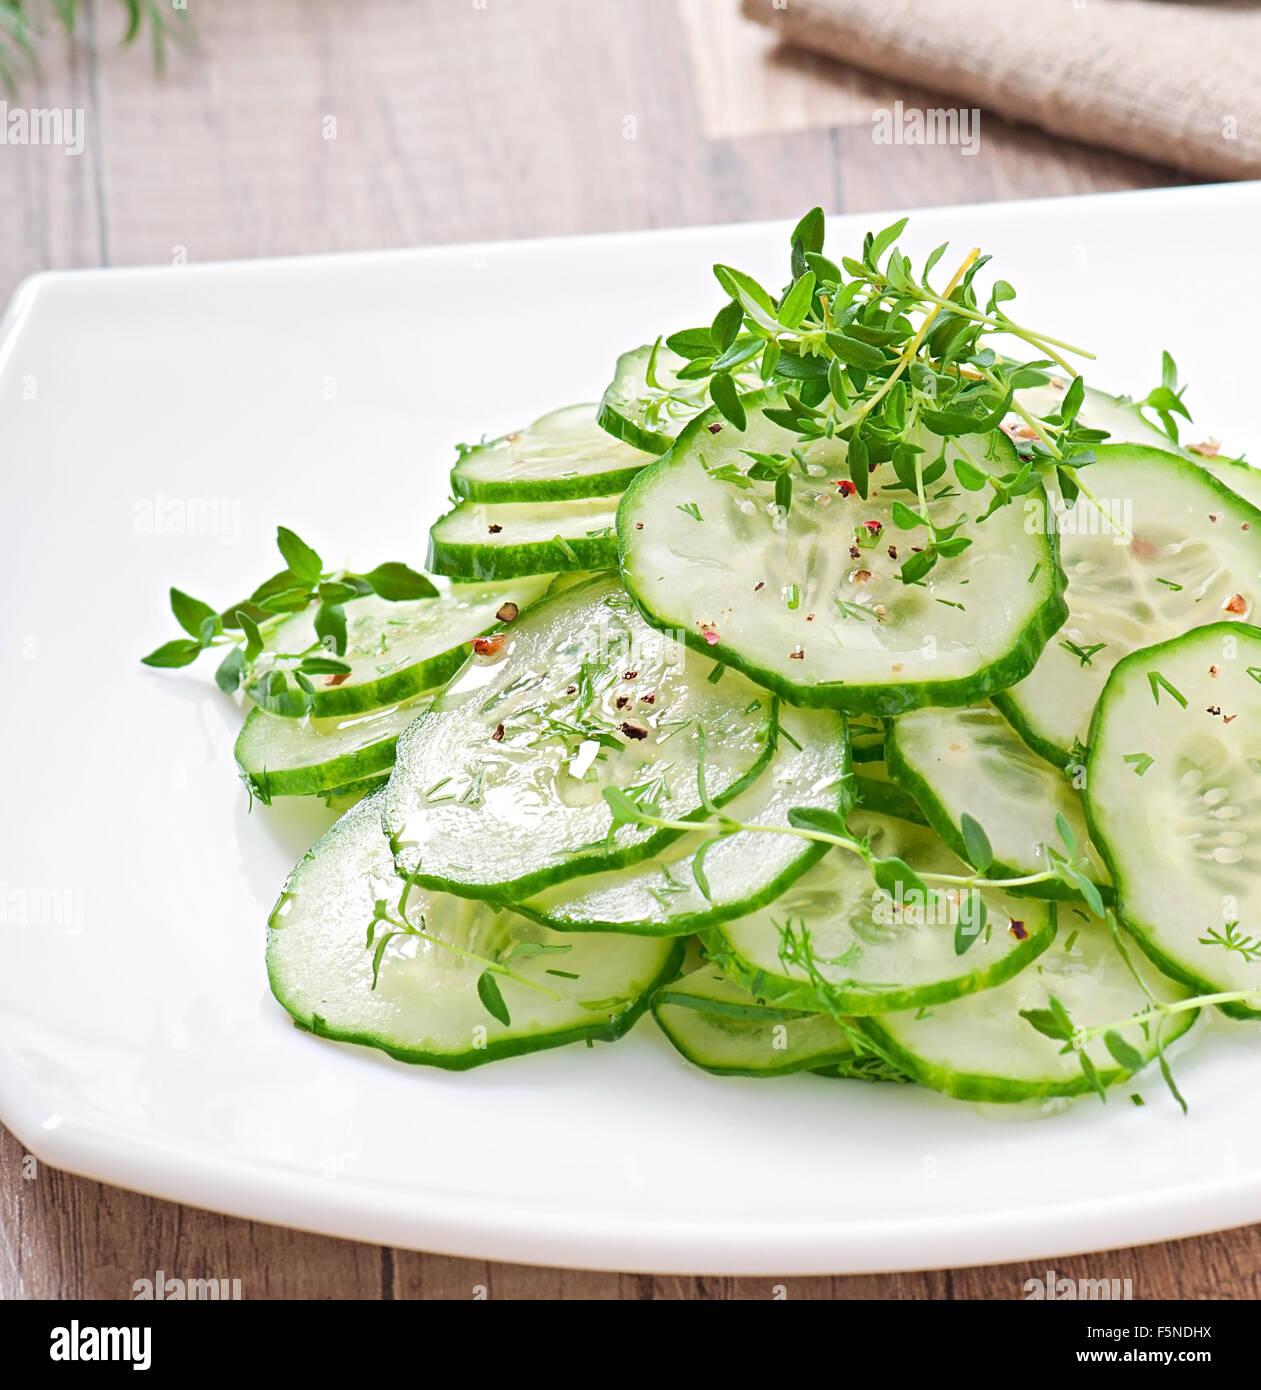 Cucumber salad - Stock Image